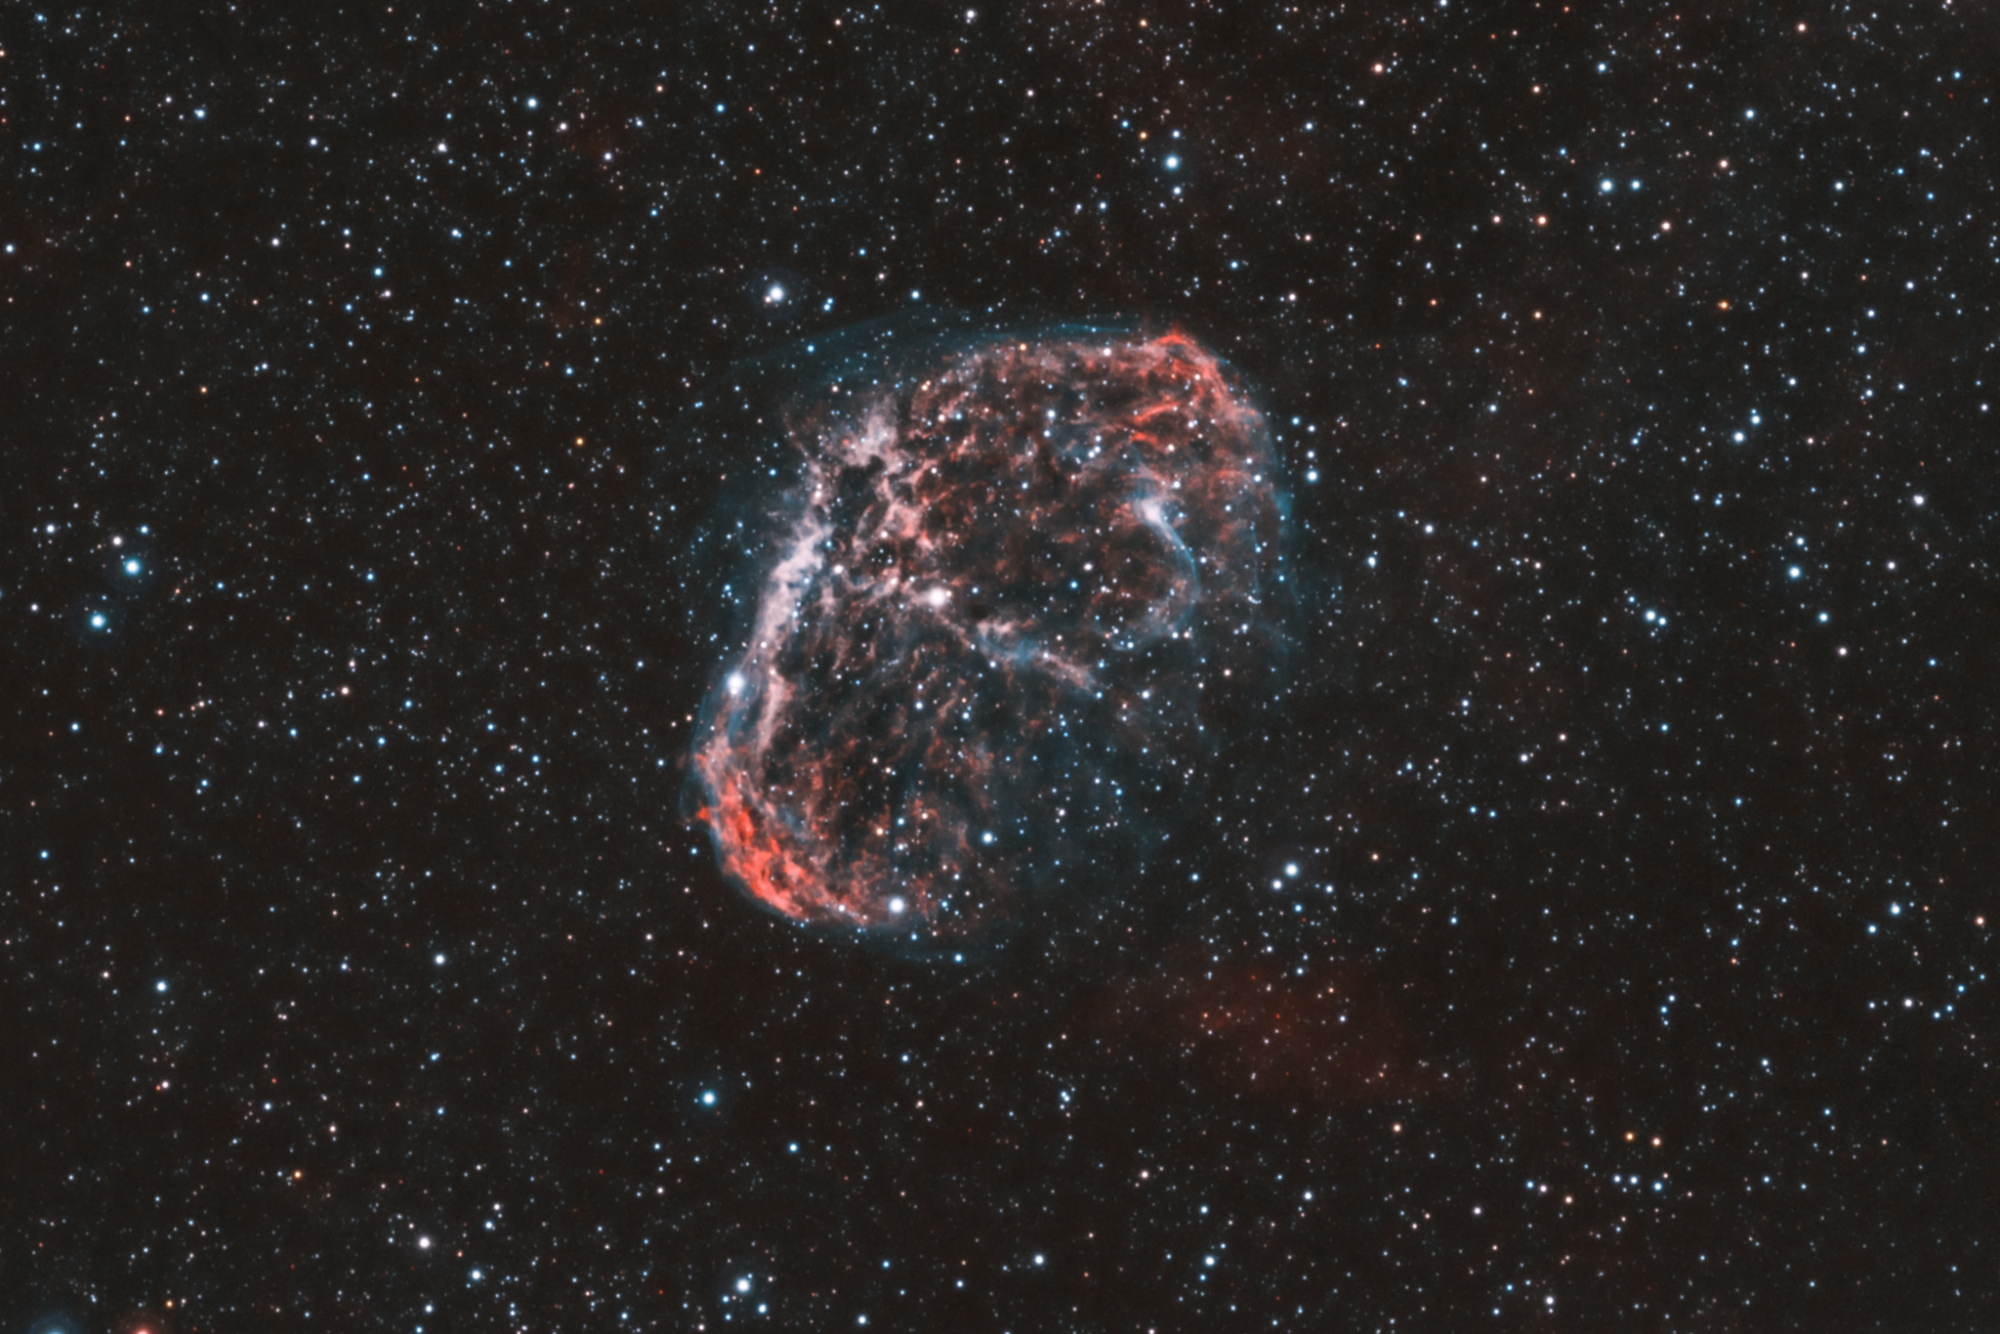 5d45ea6e9ab93_NGC6888HOO-Crop-2048.thumb.JPG.fb6eced58481f2f9800f5c90fad064fb.JPG